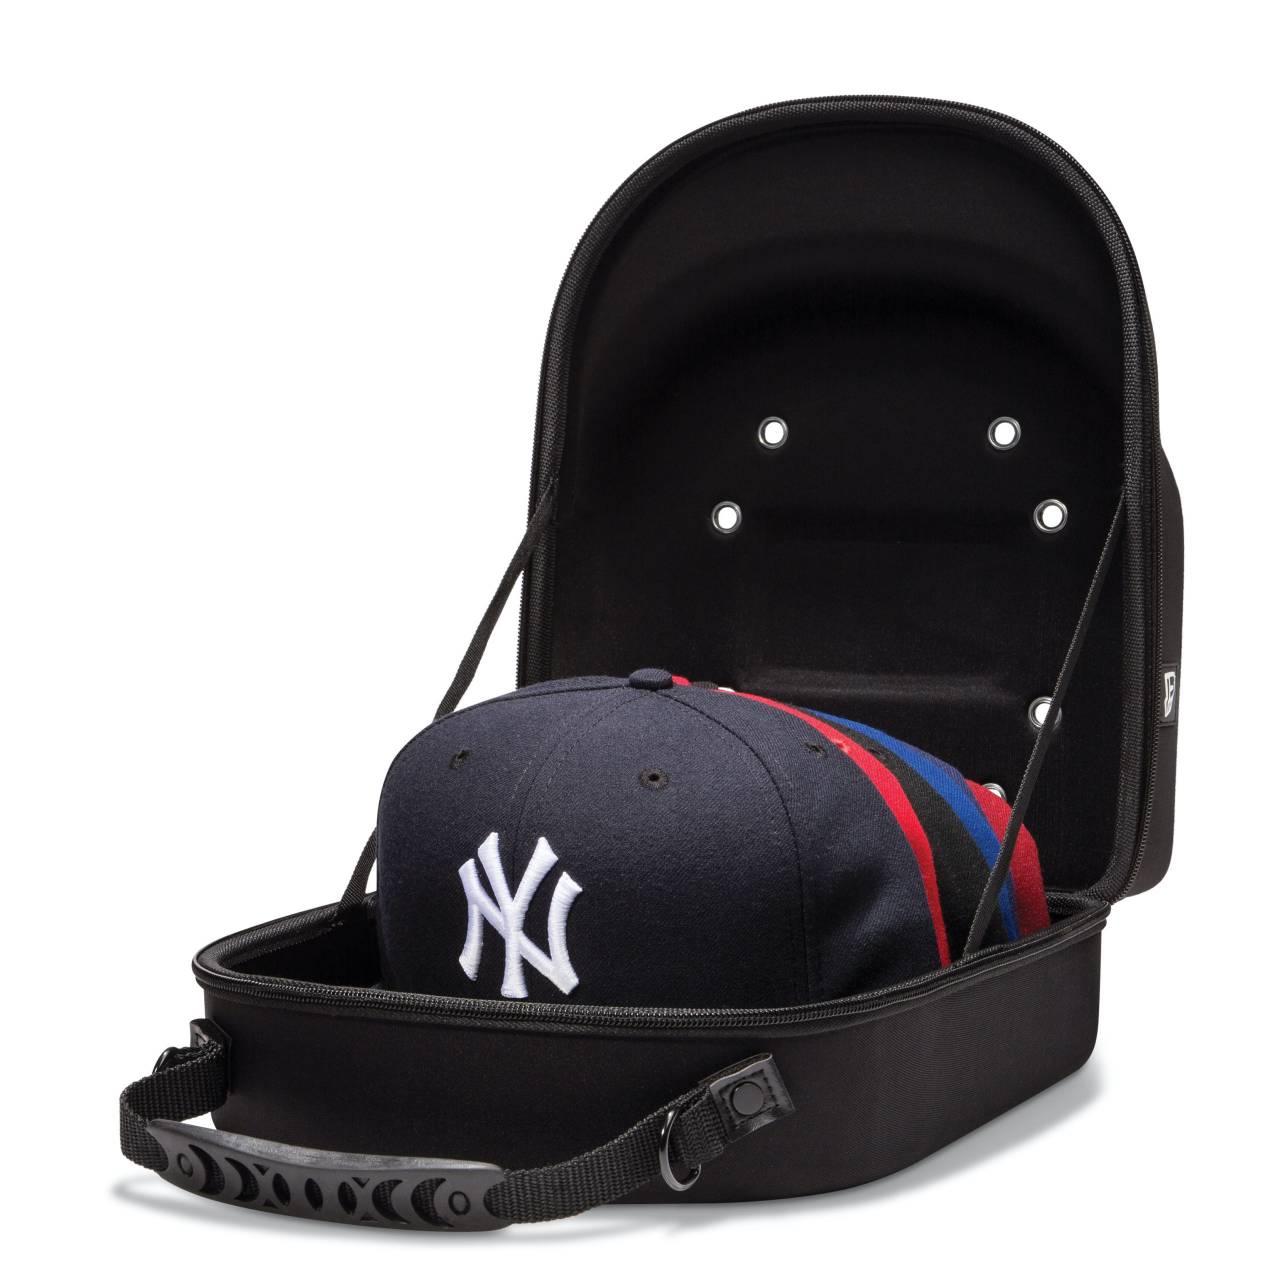 10030709 CAP CARRIER 6PACK NEW ERA BLACK BAG